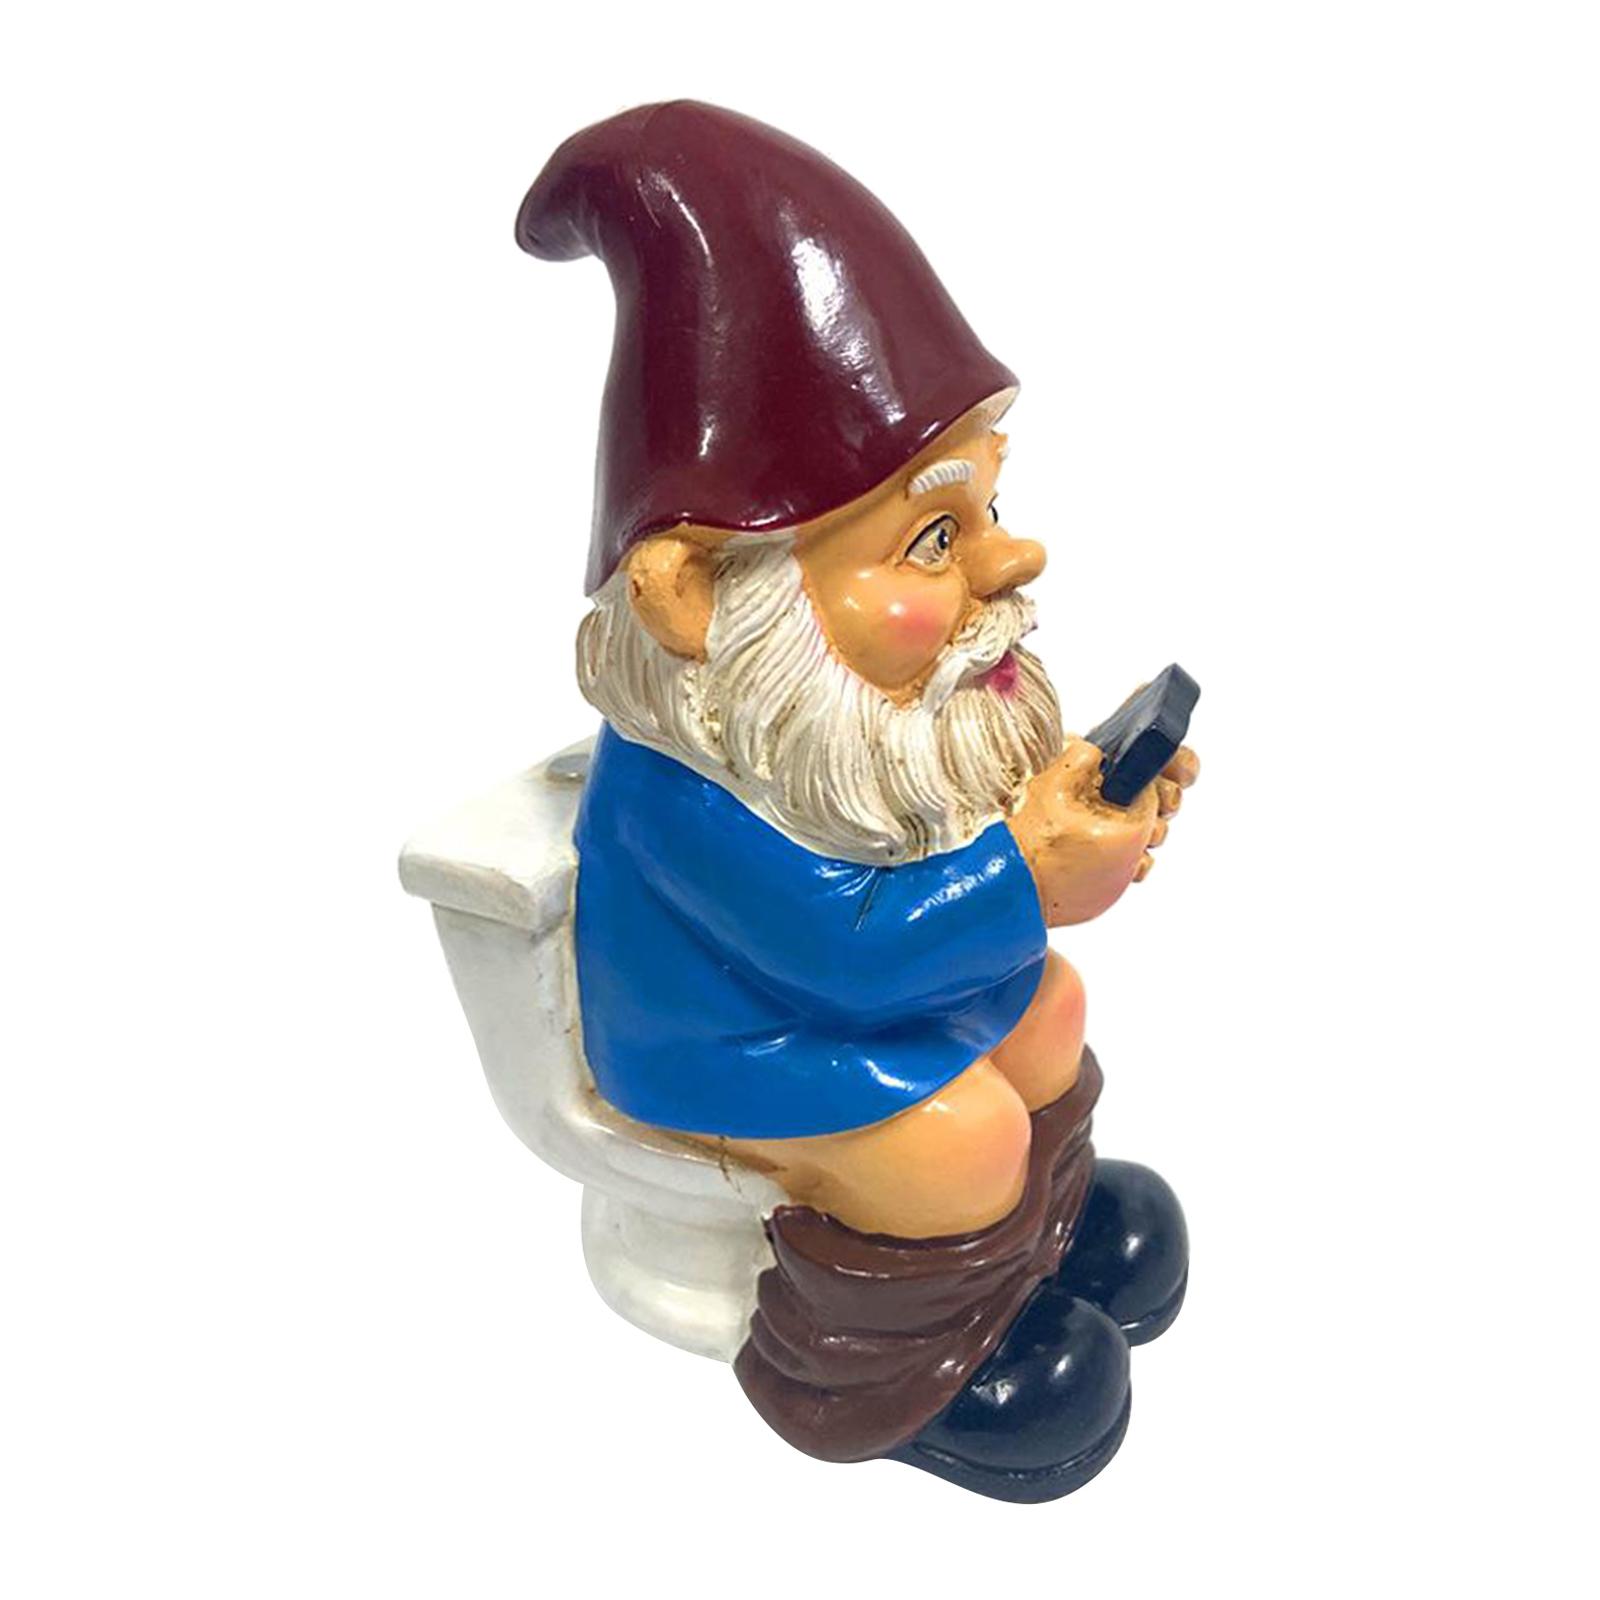 thumbnail 33 - Funny Resin Naughty Garden Gnome Statue Ornaments Outdoor Villa Home Figurines